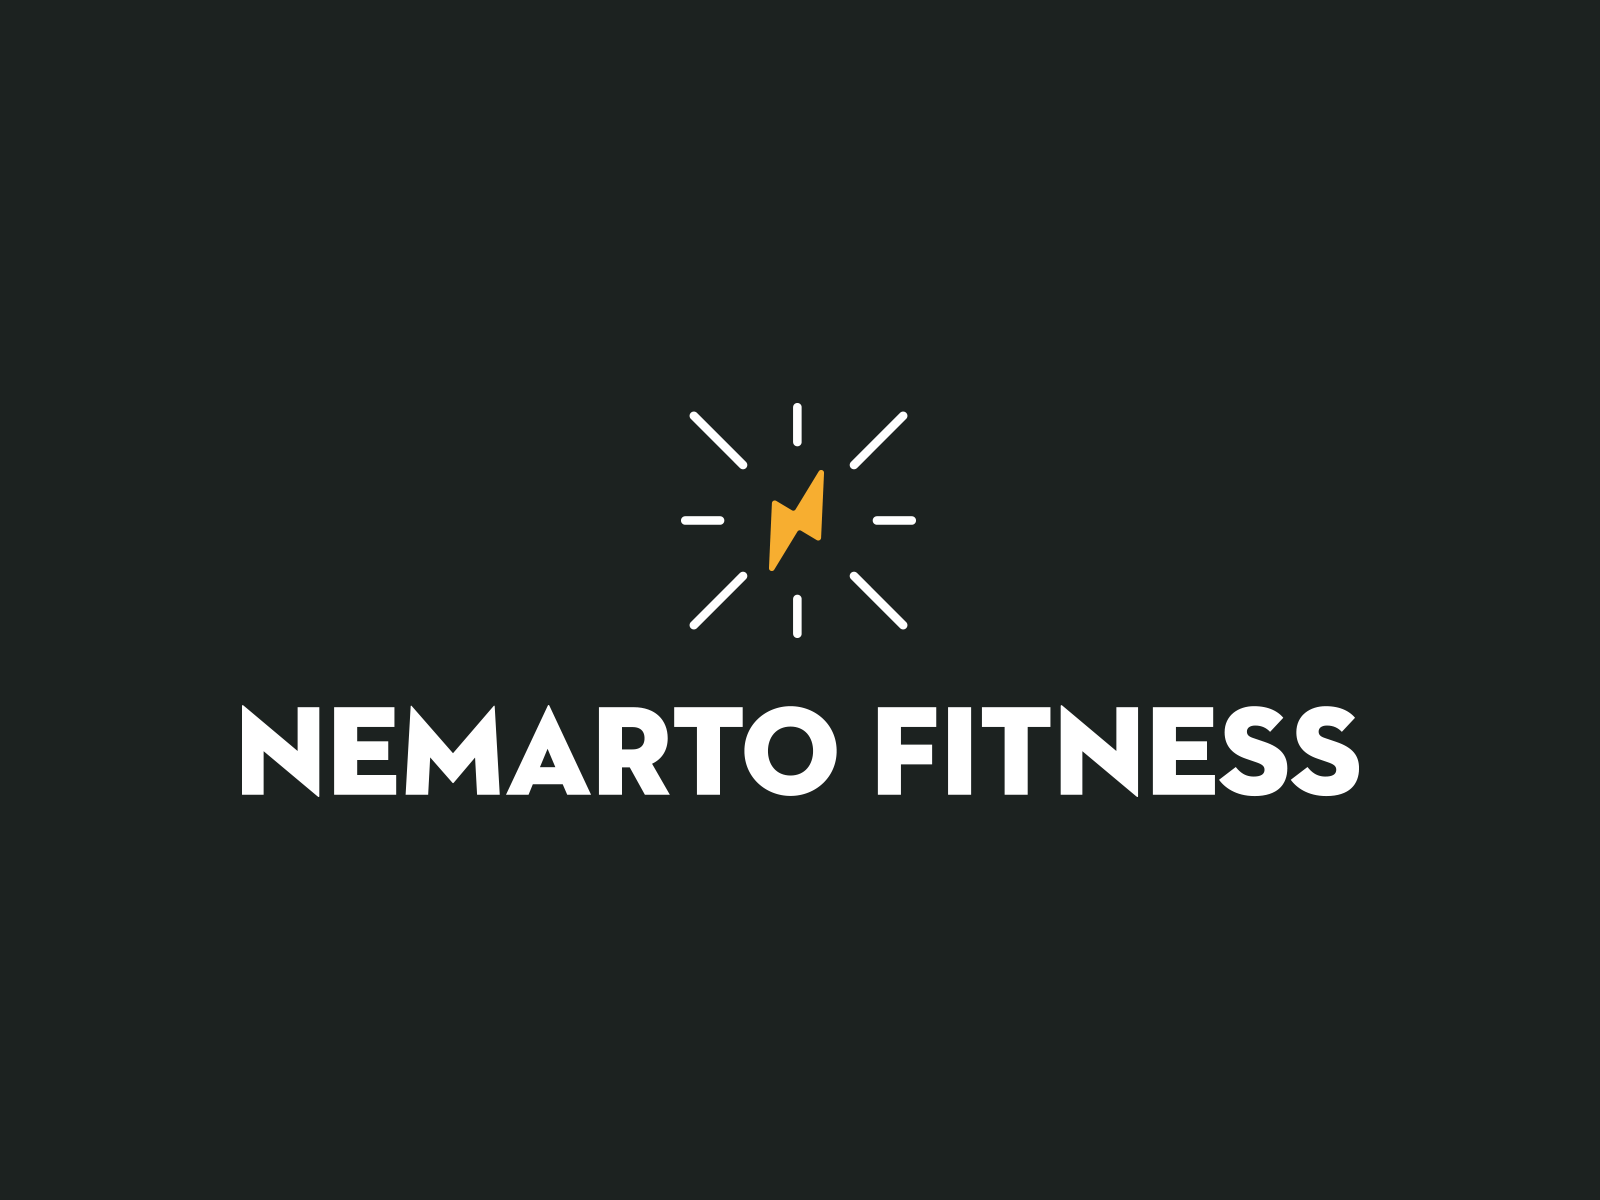 Nemarto Fitness Logo